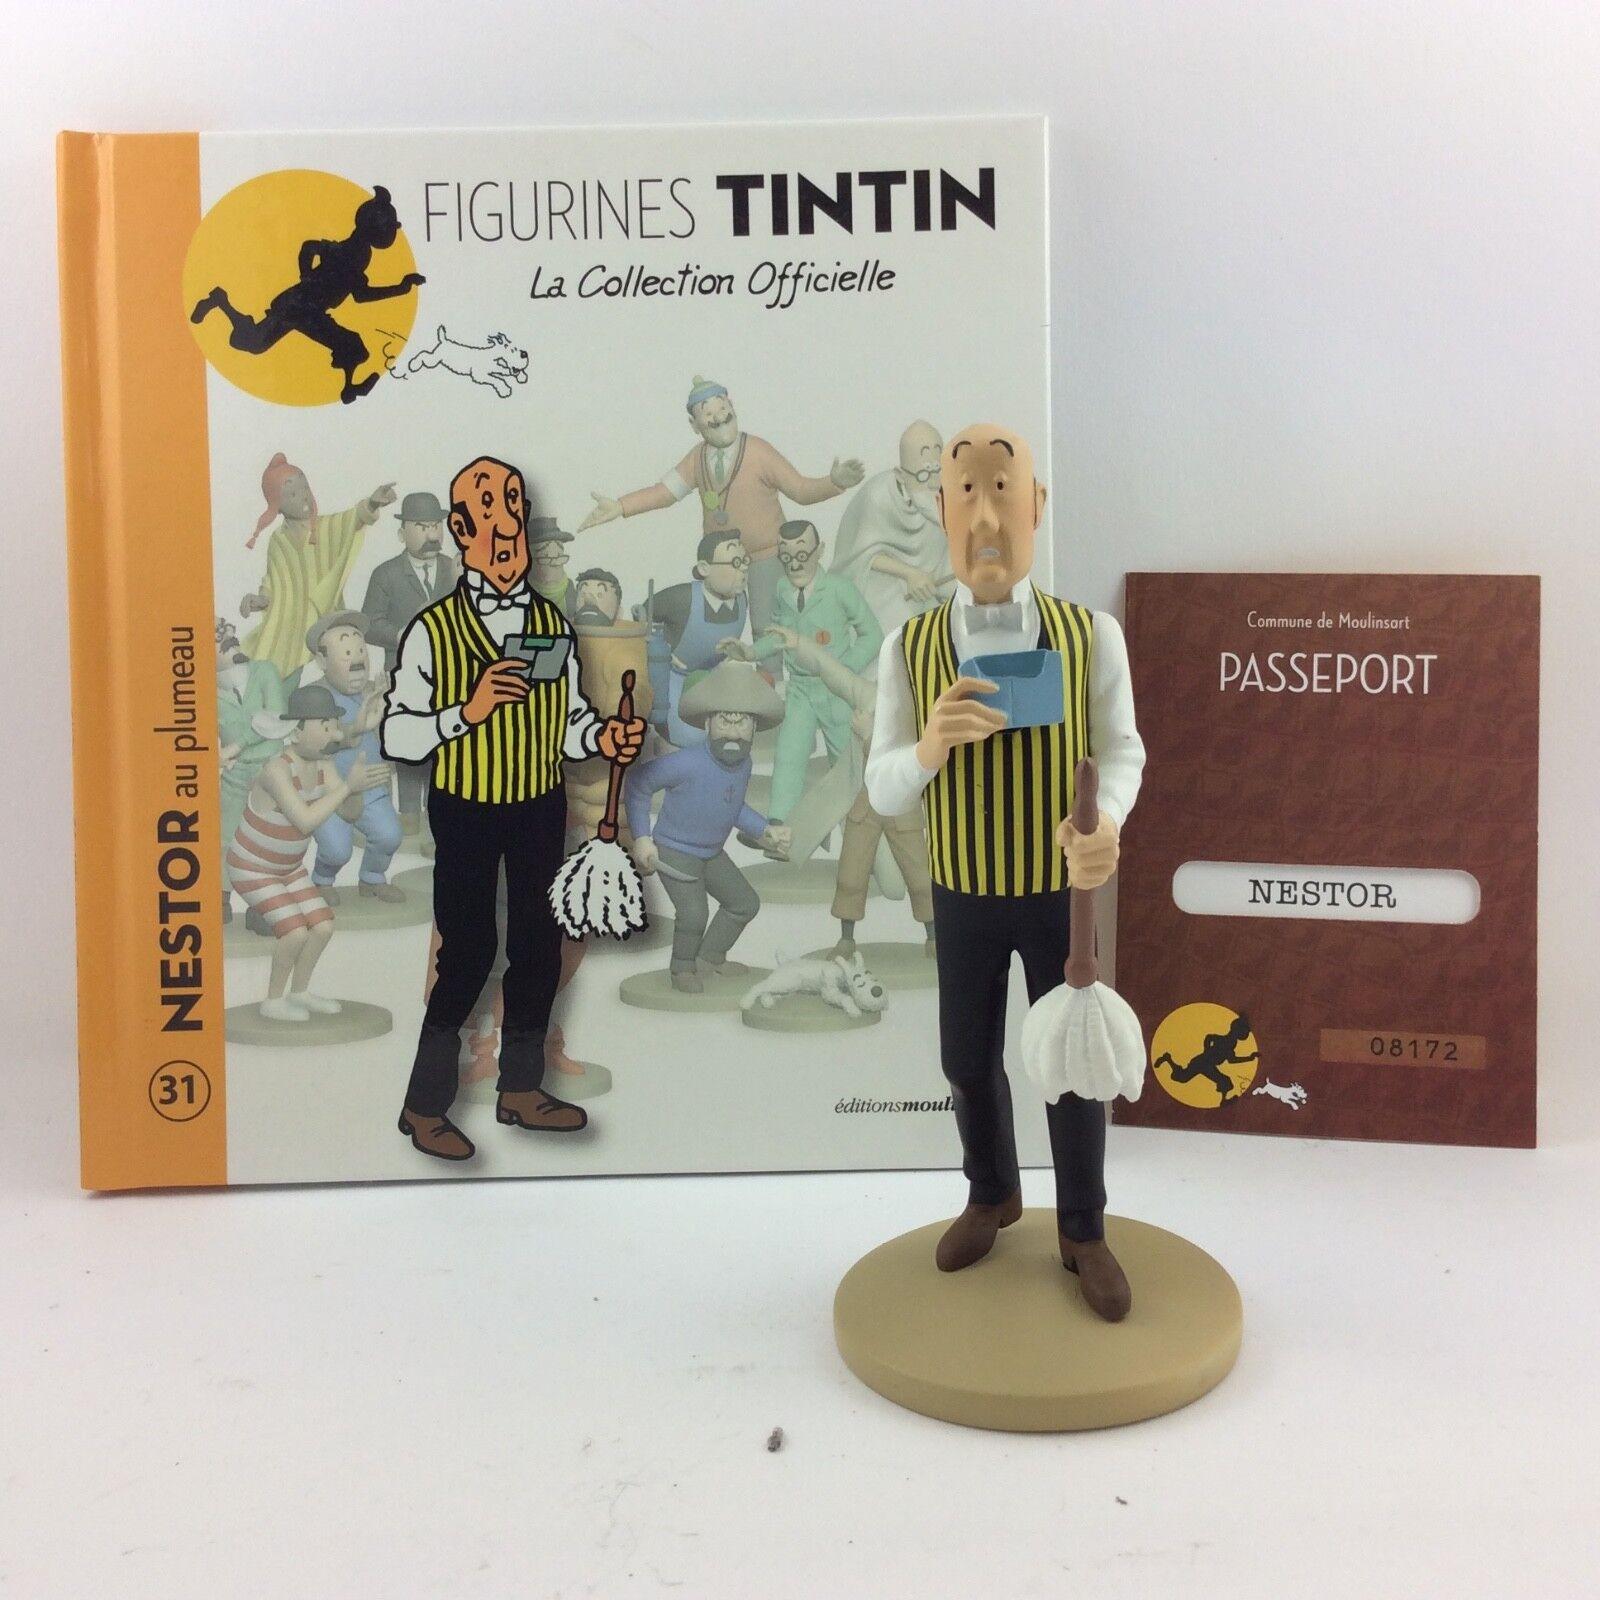 Collection officielle figurine Tintin Moulinsart 31 Nestor au plumeau